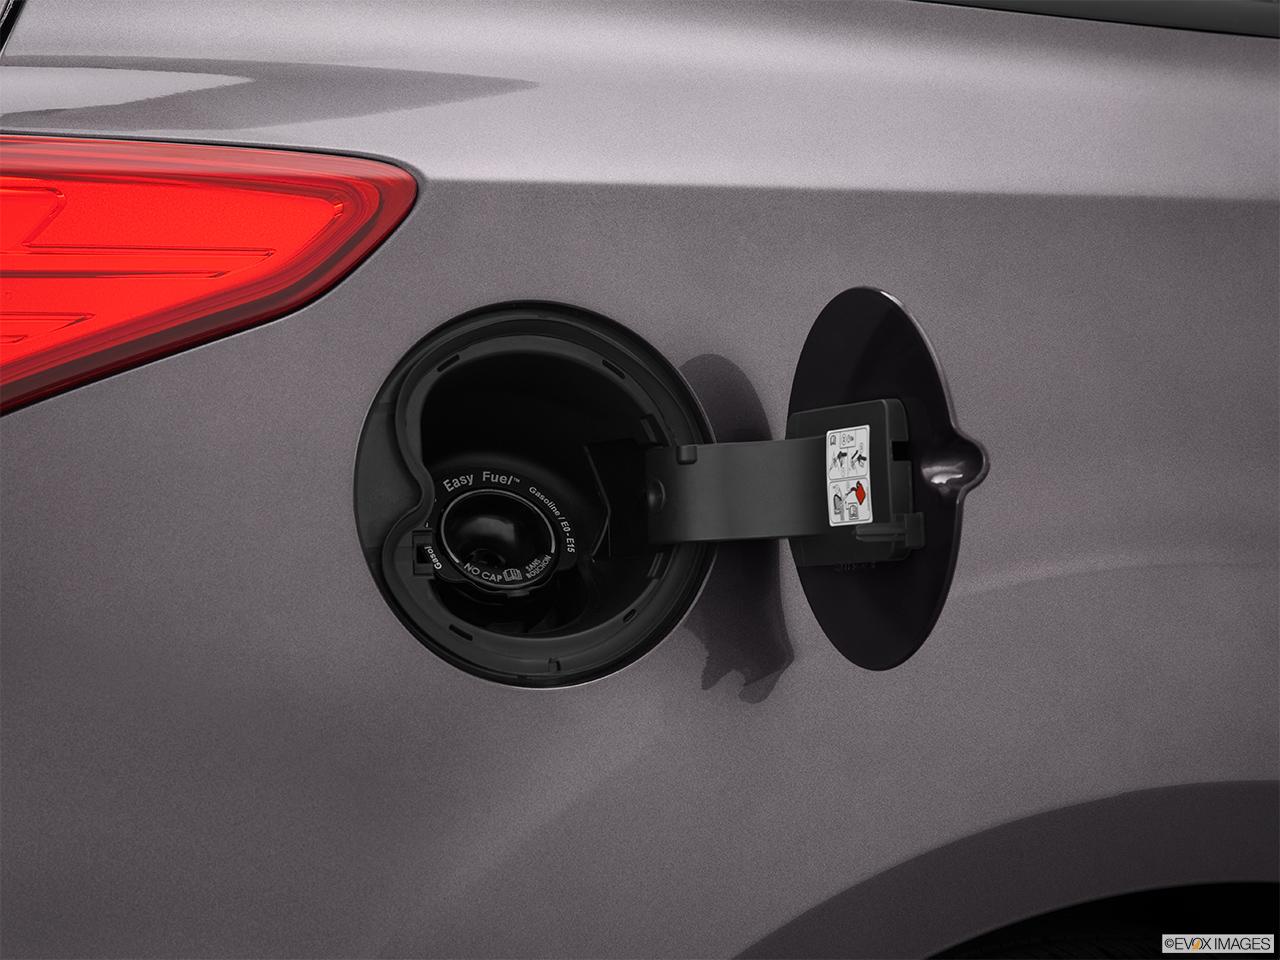 2015 ford focus 4dr sedan s gas cap open. Black Bedroom Furniture Sets. Home Design Ideas